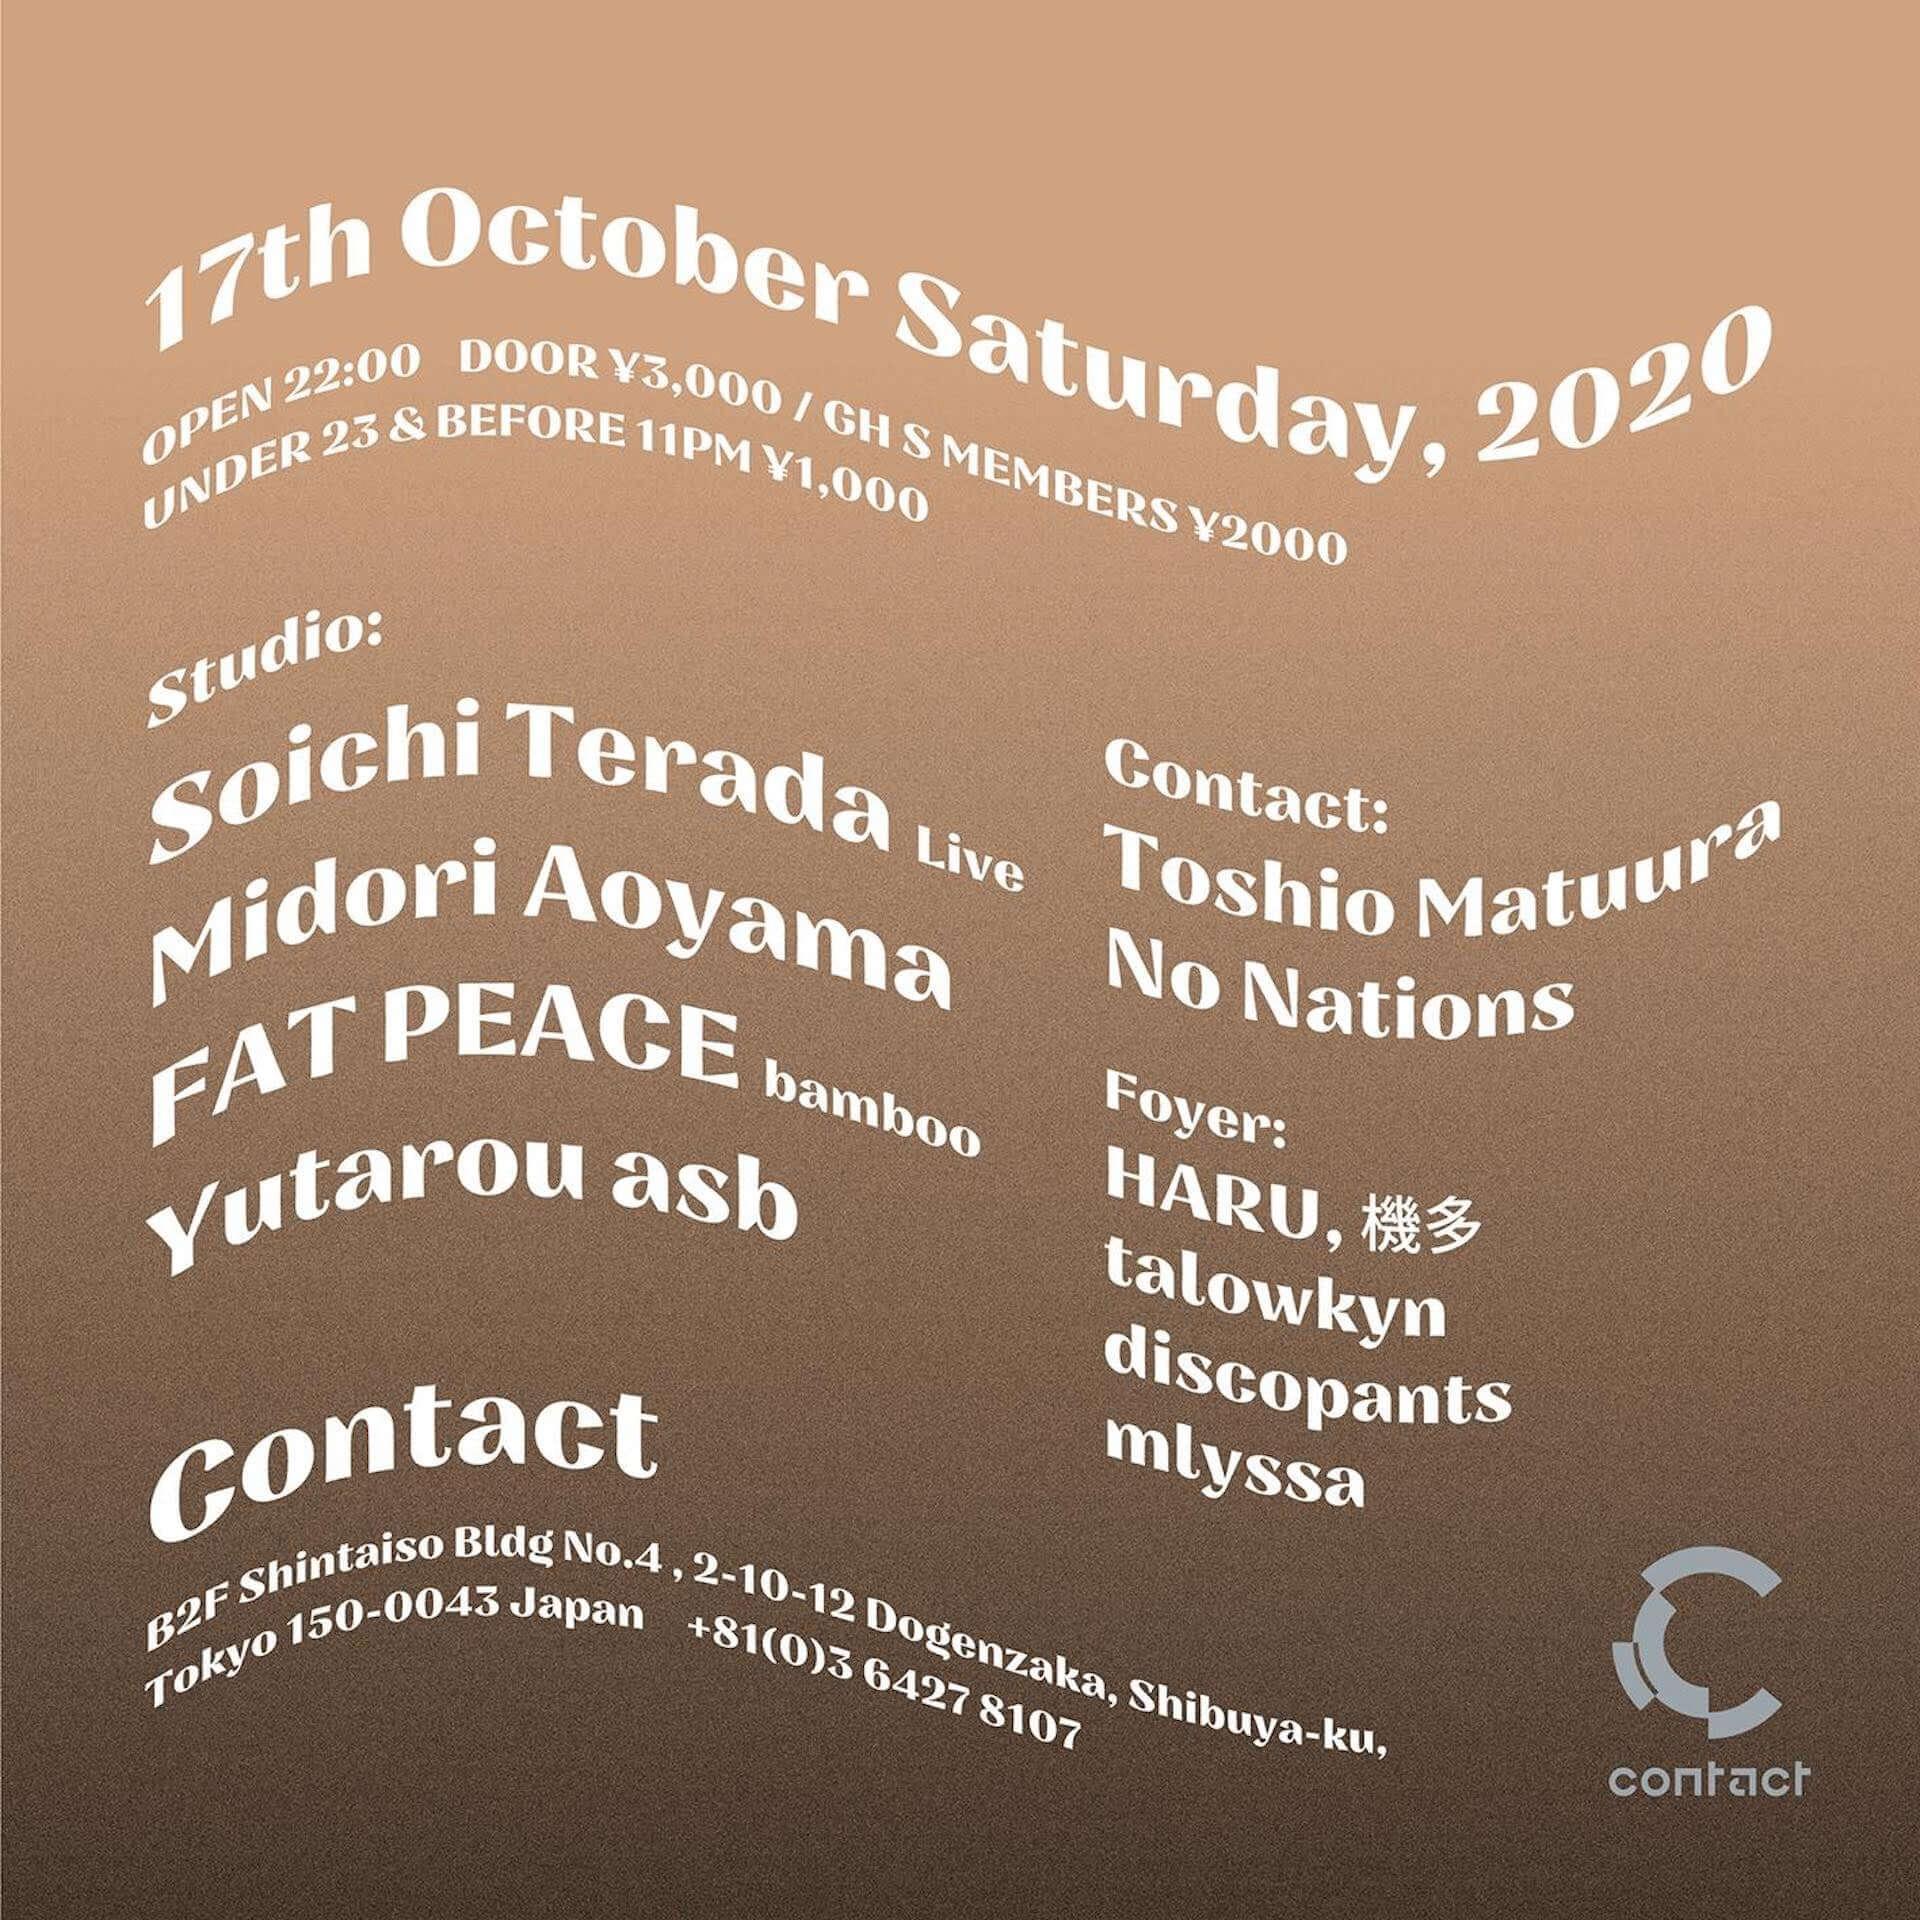 Midori Aoyamaが渋谷Contactで新パーティ<WILDHEART>を始動!Soichi Terada、Toshio Matsuuraらが出演 music201005_contact-wildheart-_3-1920x1920